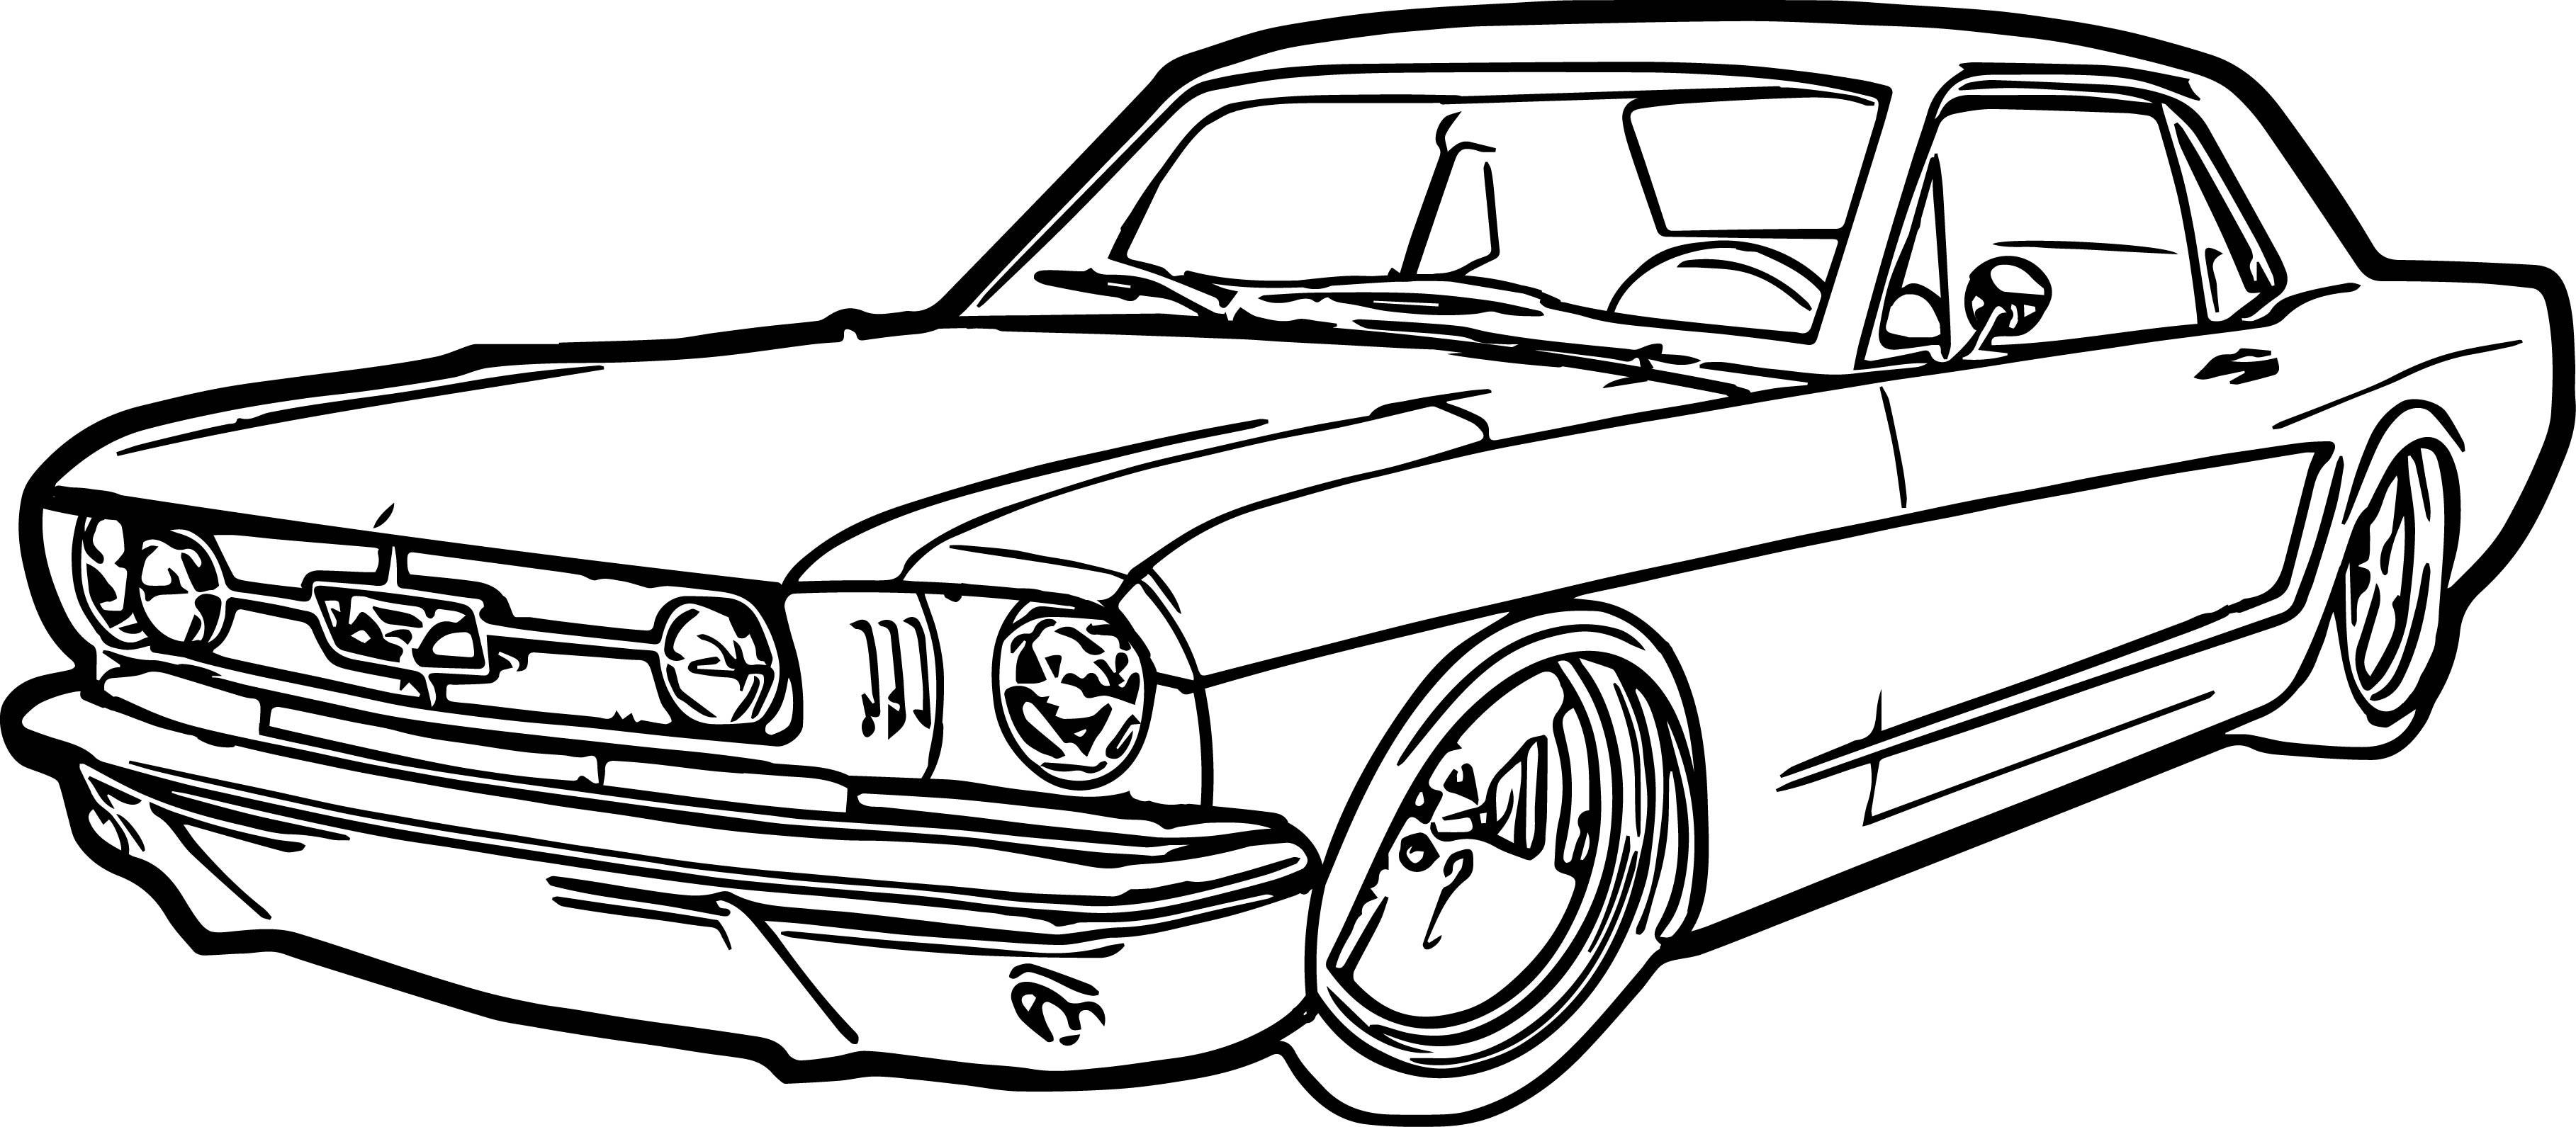 Sprint Car Drawing At Getdrawings